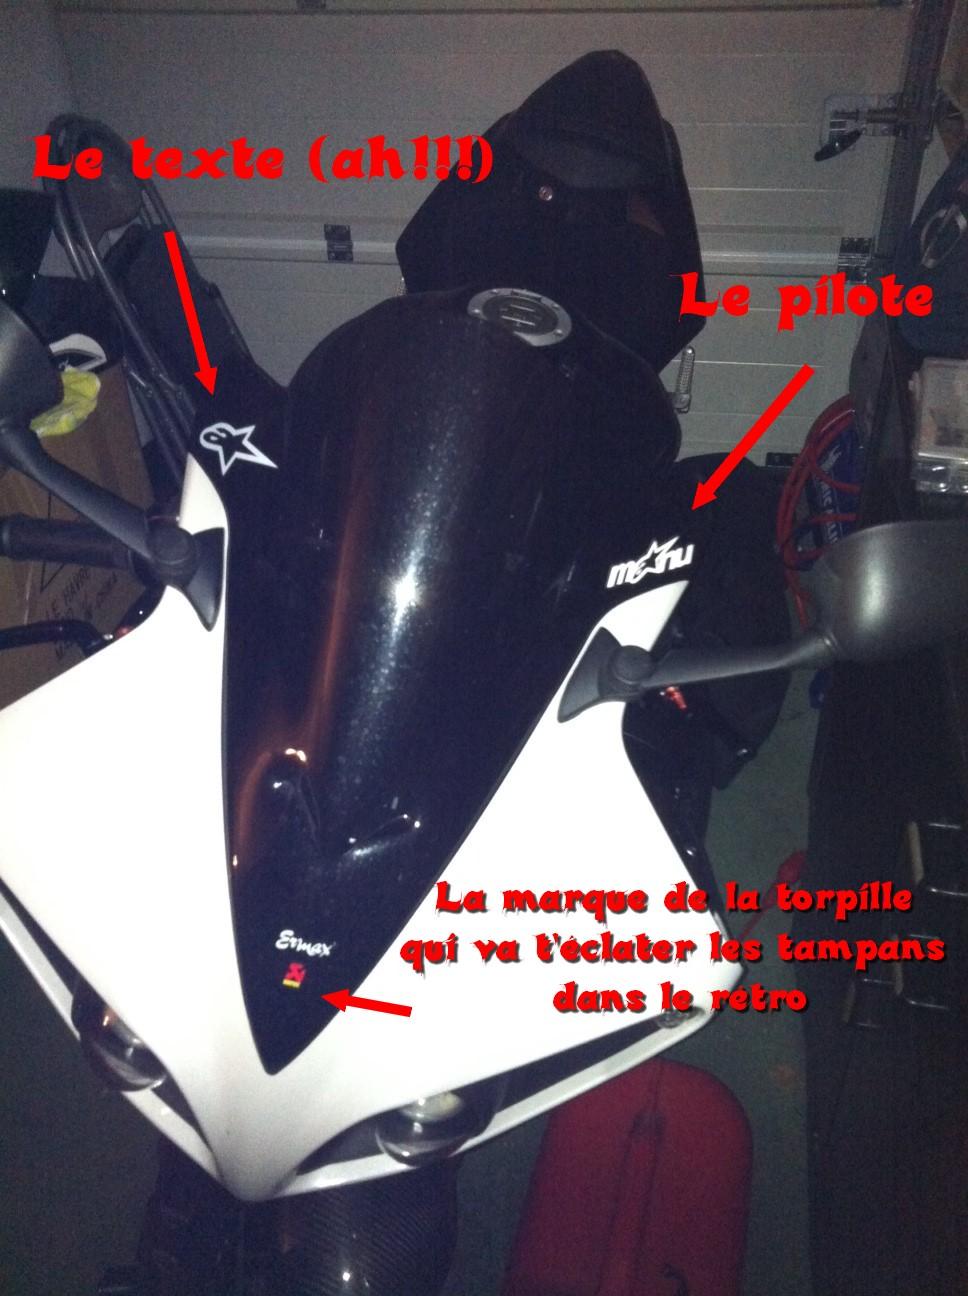 forums topics des membres playmo yzf r1 2007 motos bandit. Black Bedroom Furniture Sets. Home Design Ideas